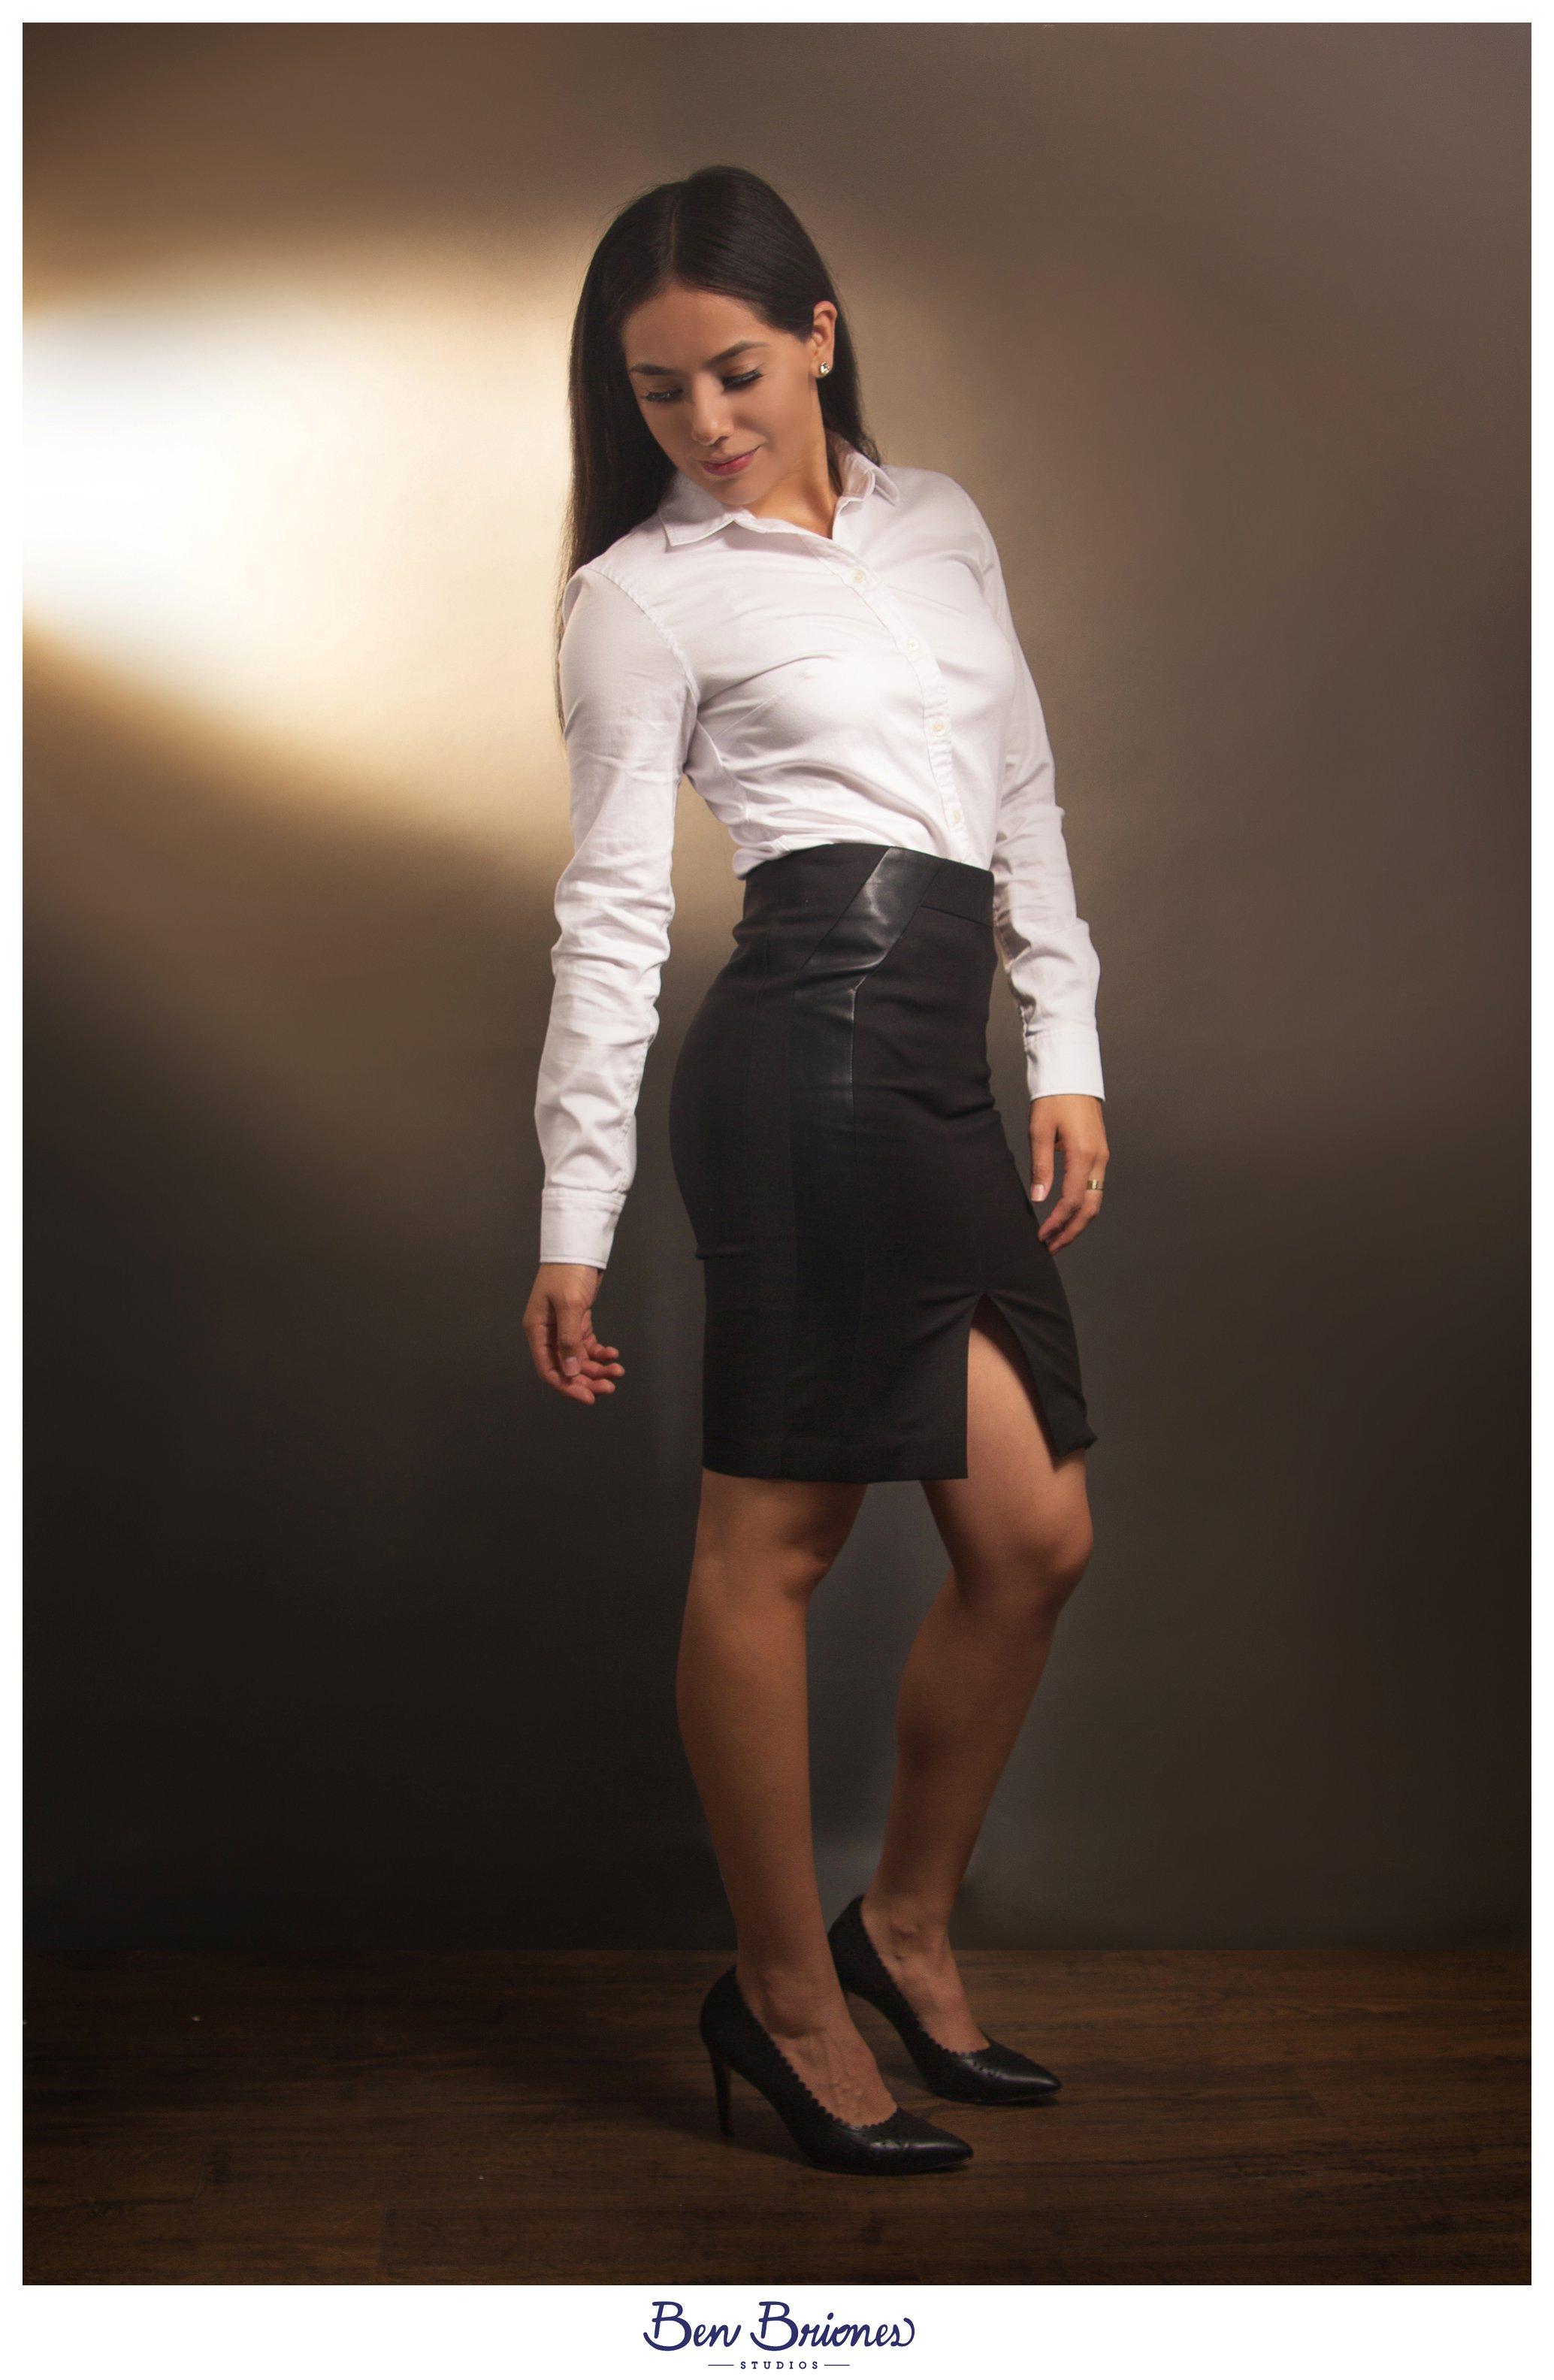 06.03.17_PRINT_Lorena Garcia Portraits_BBS-6268_pp